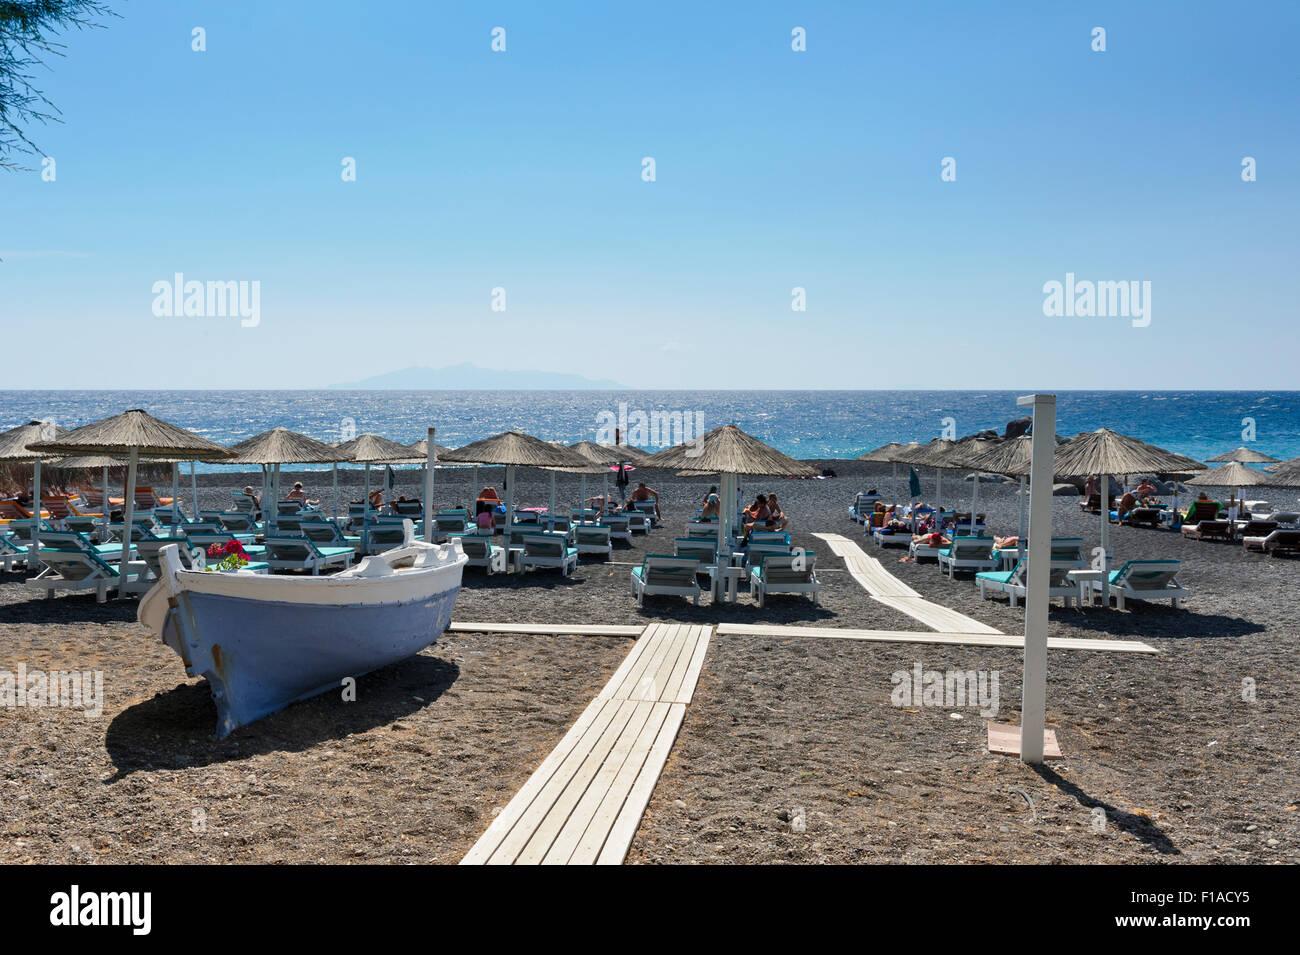 Sunbathers under straw umbrellas on Kamari beach, Santorini, Greece. - Stock Image